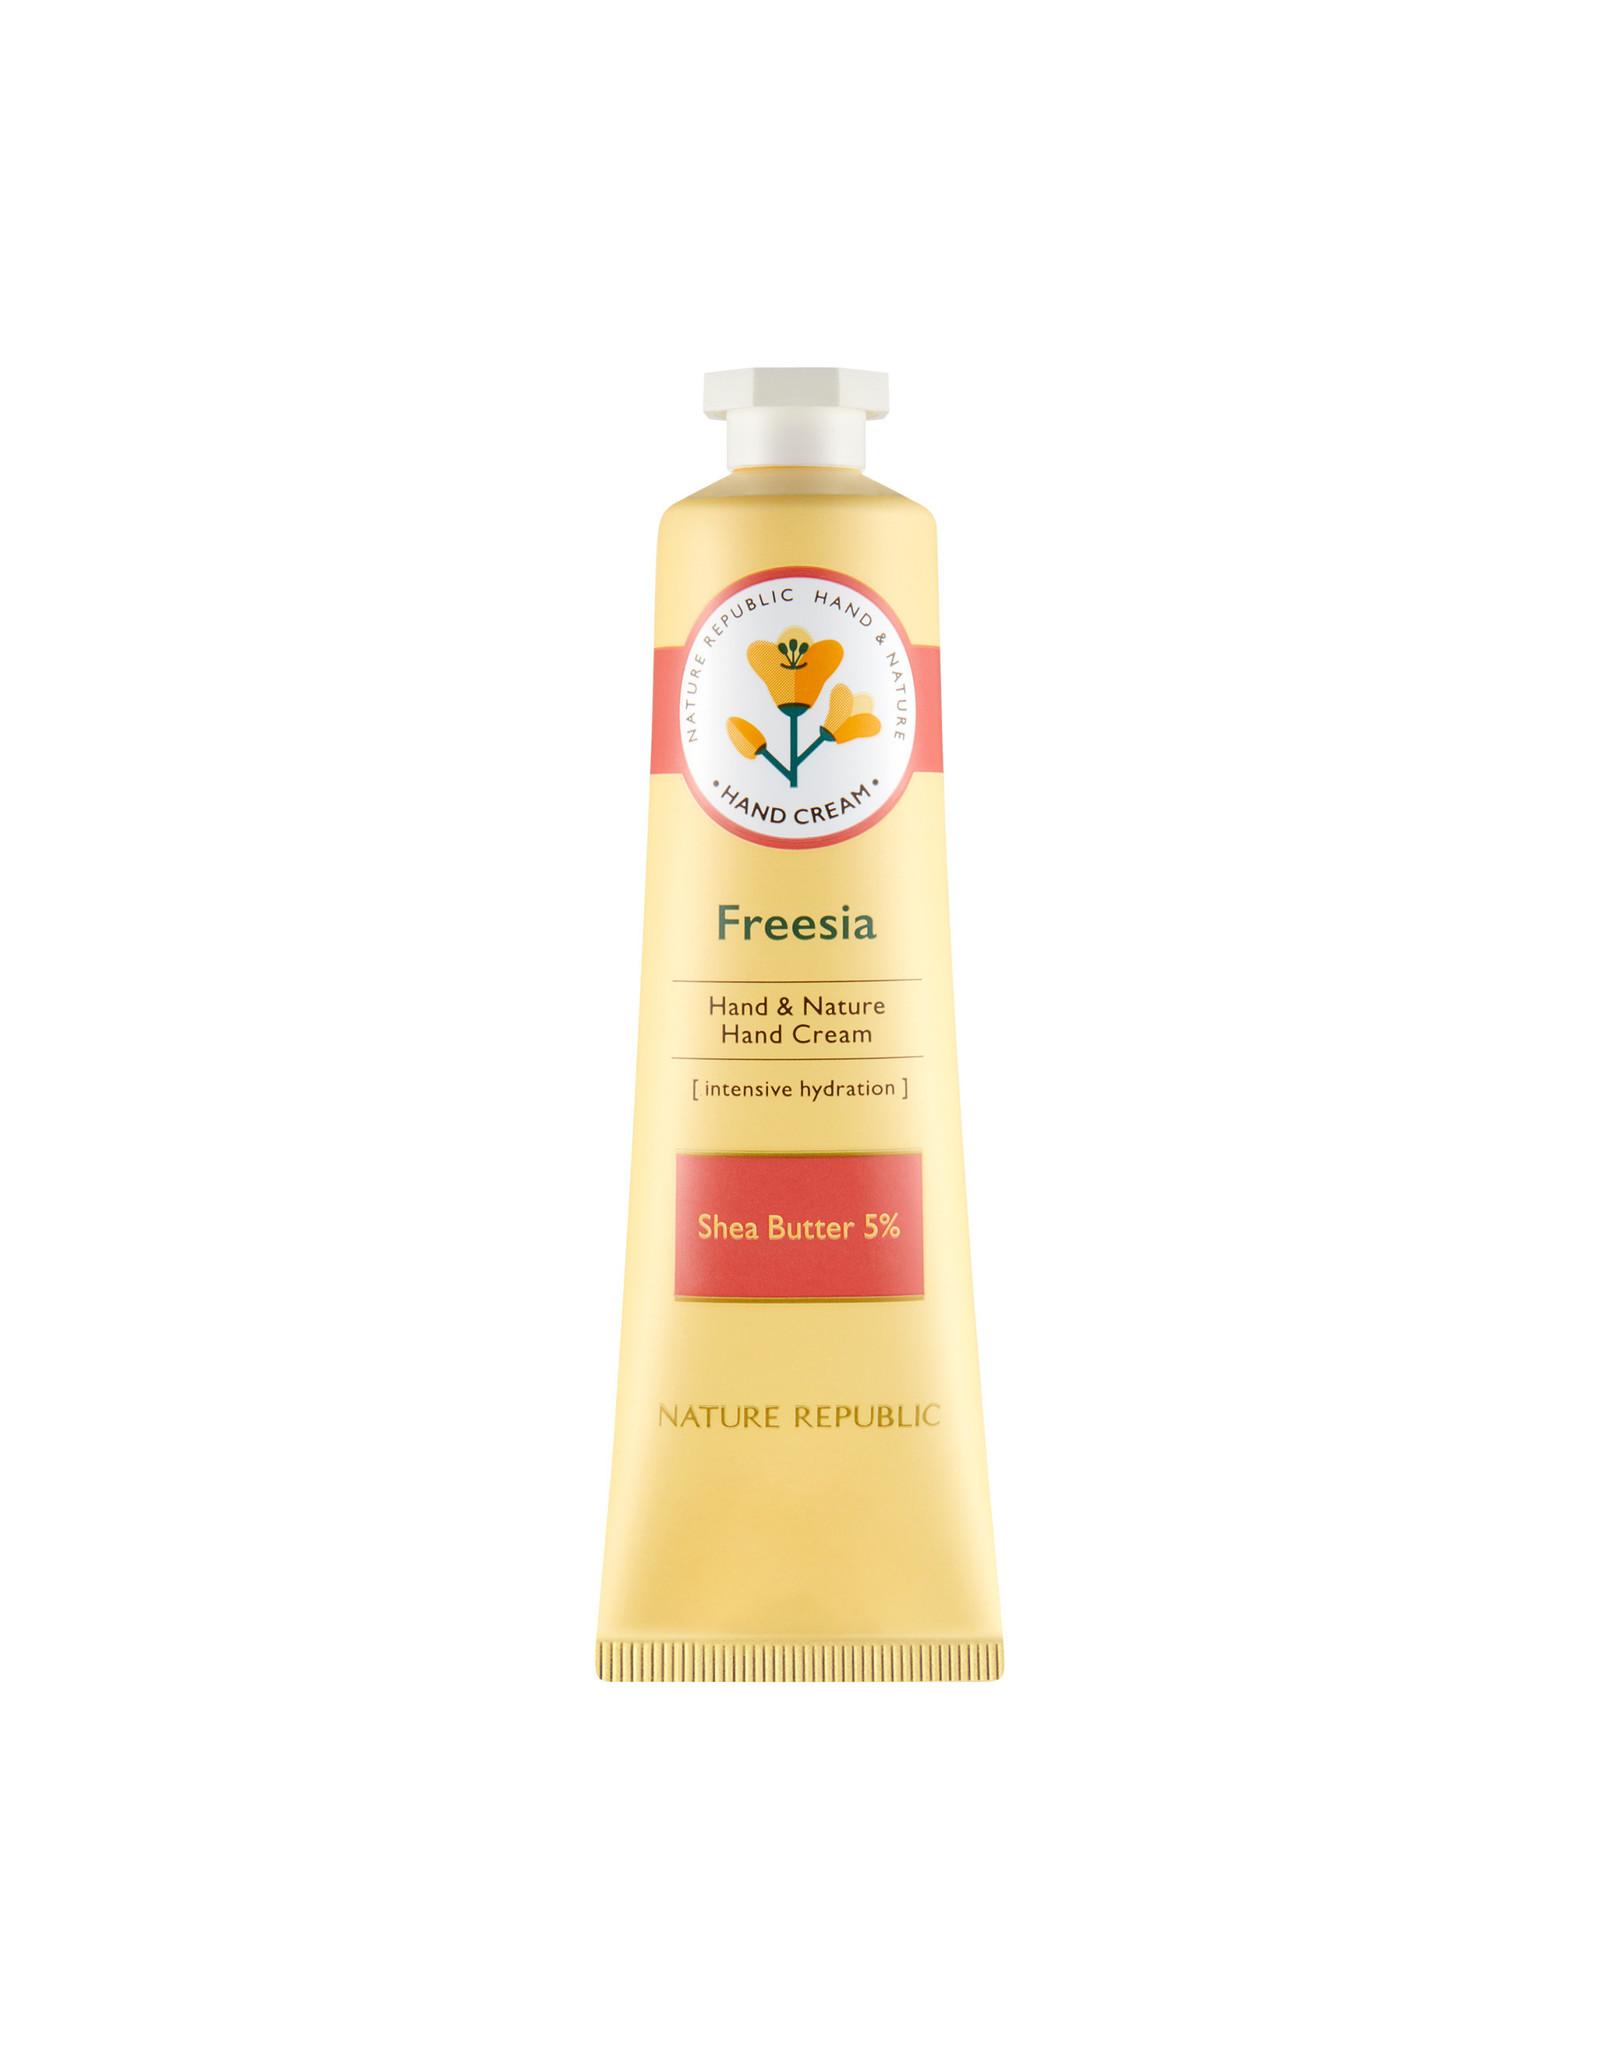 Hand & Nature Hand Cream Freesia (Orig $8.90)